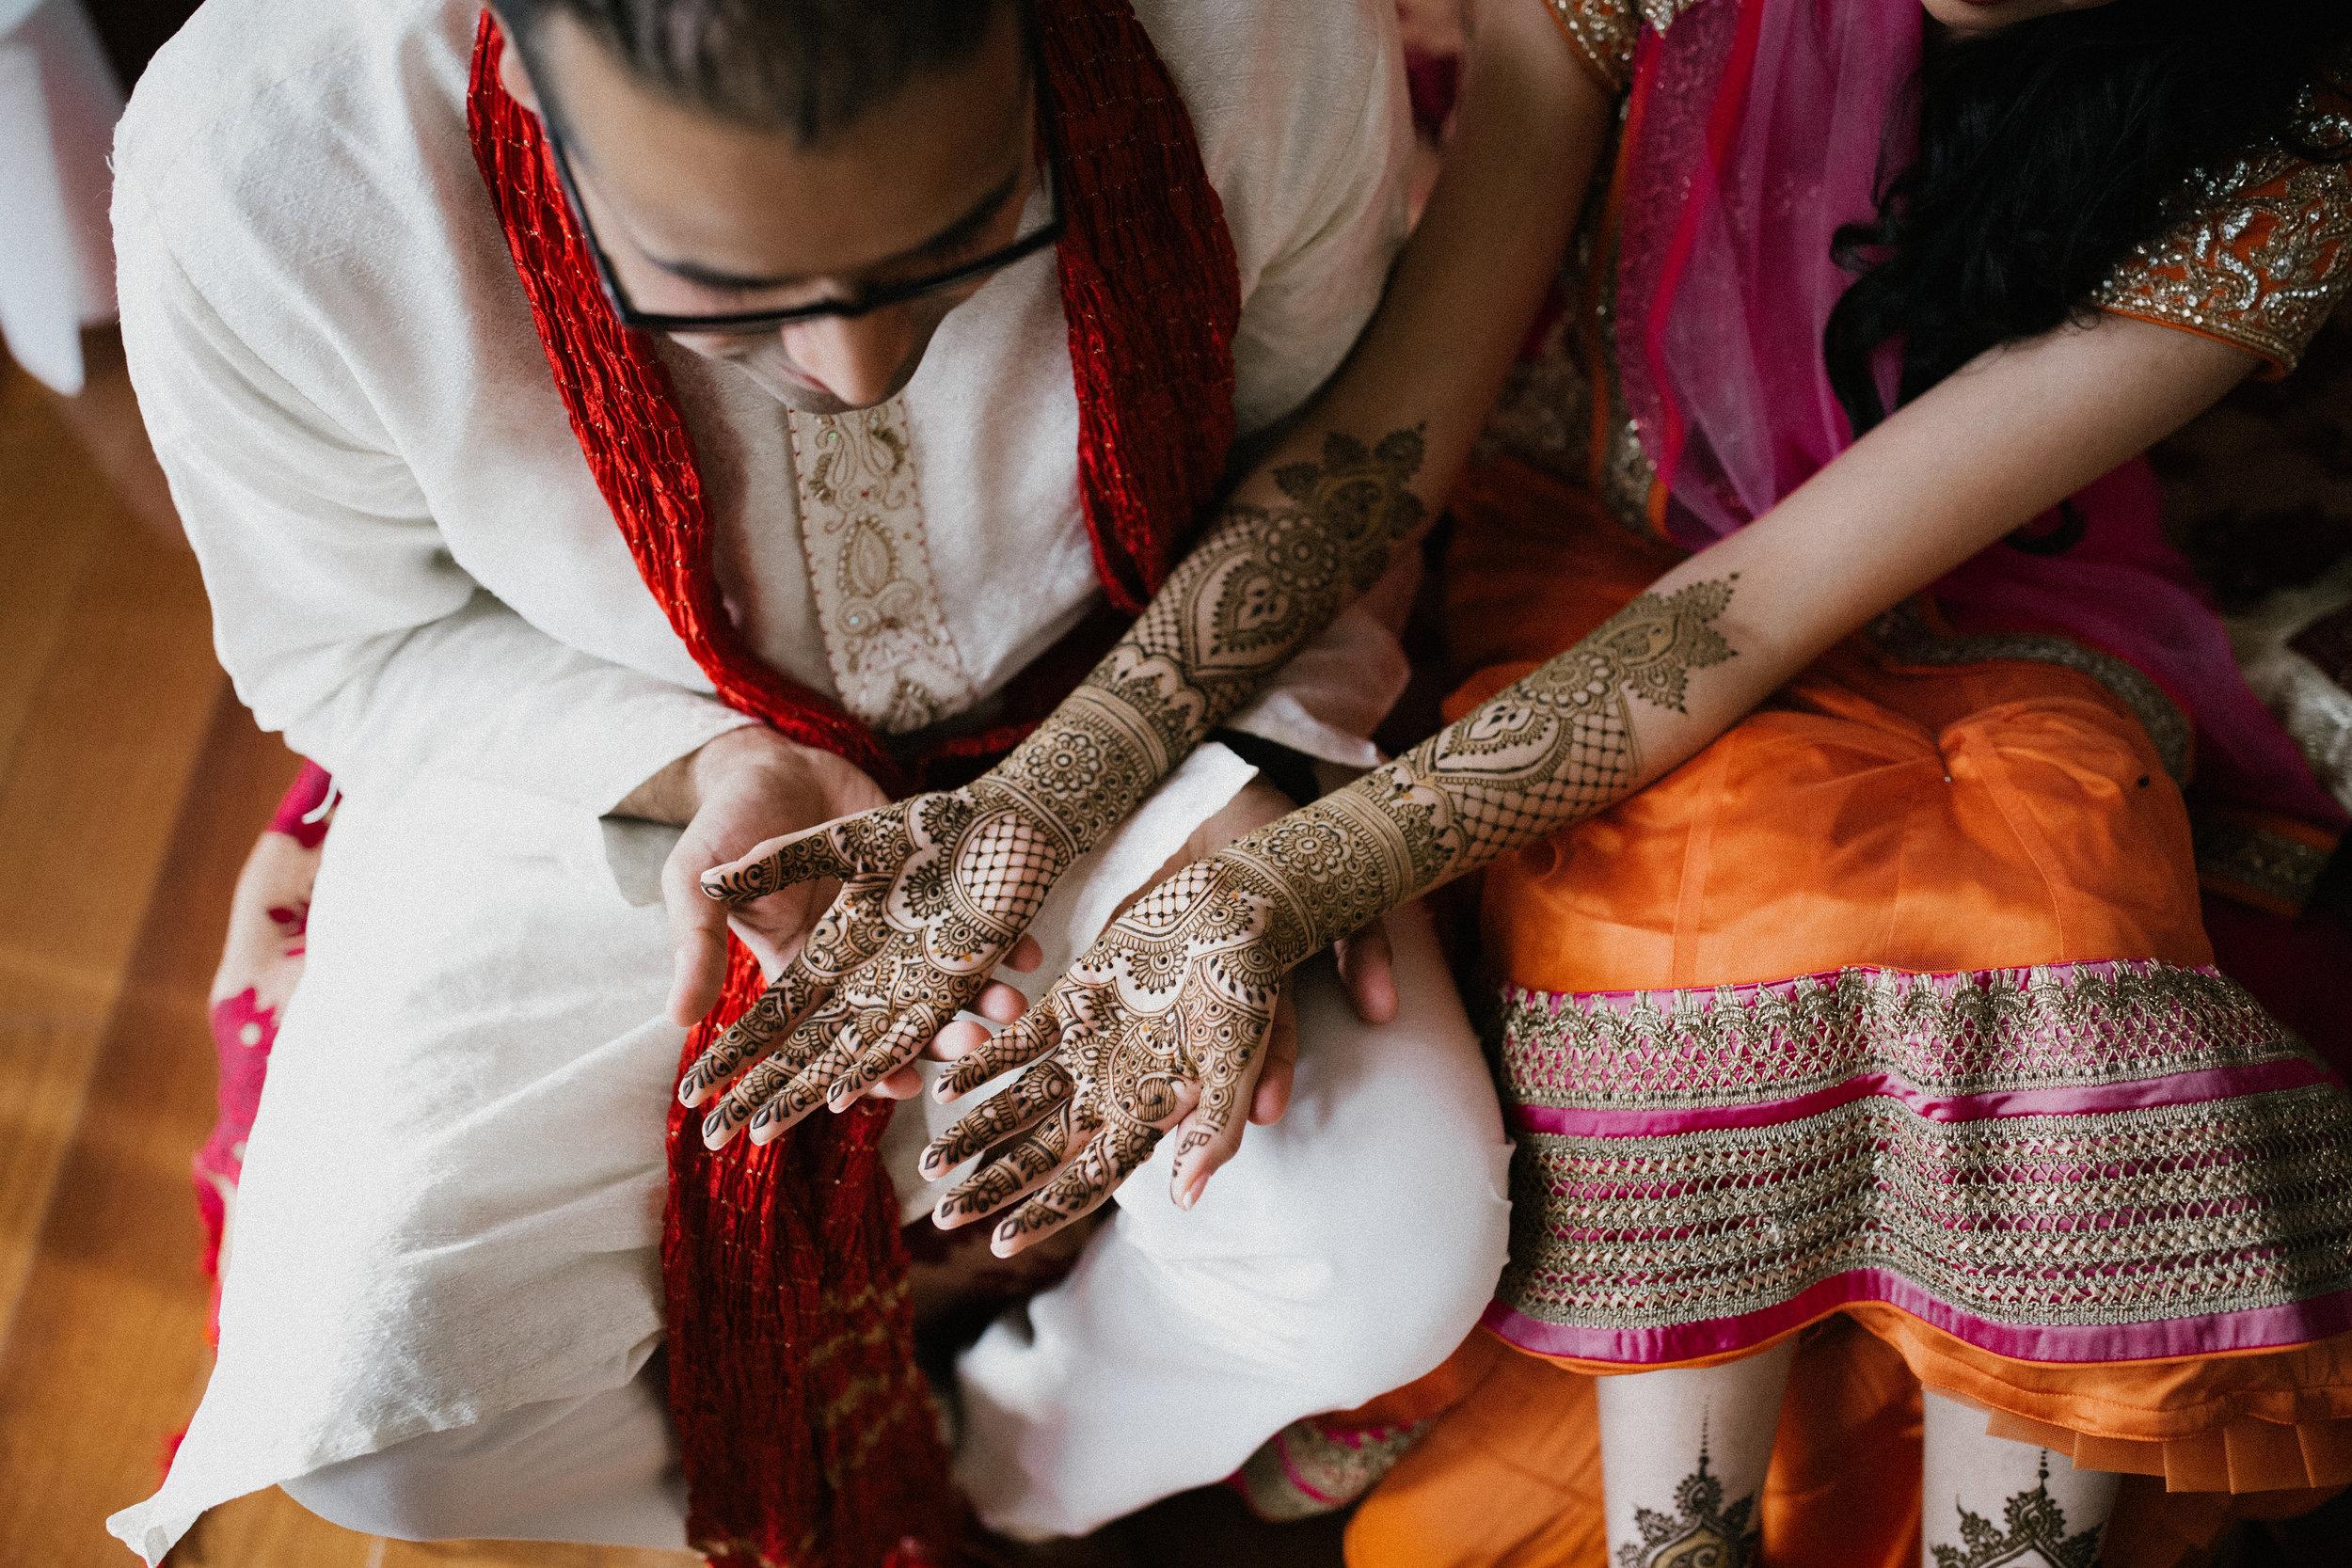 Aparna-Ankit-Patel-Mehndi-Wedding-Photos-0033.jpg